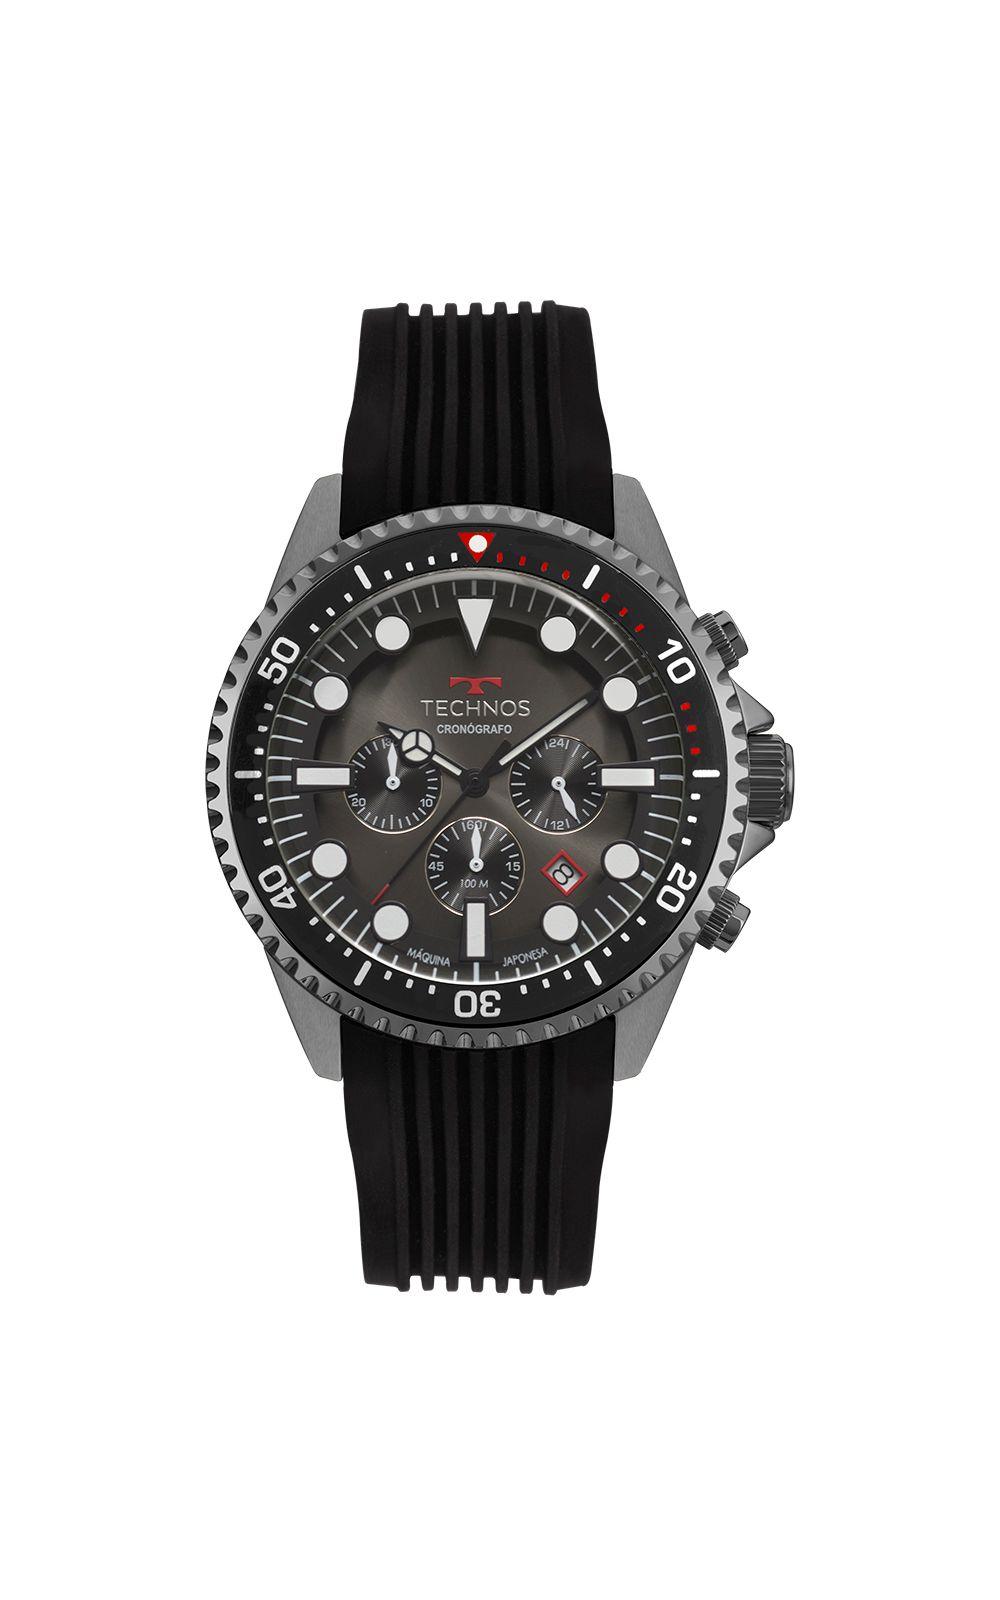 61cb88551cde6 Relógio Technos Skymaster Masculino Grafite JS25CC 8P